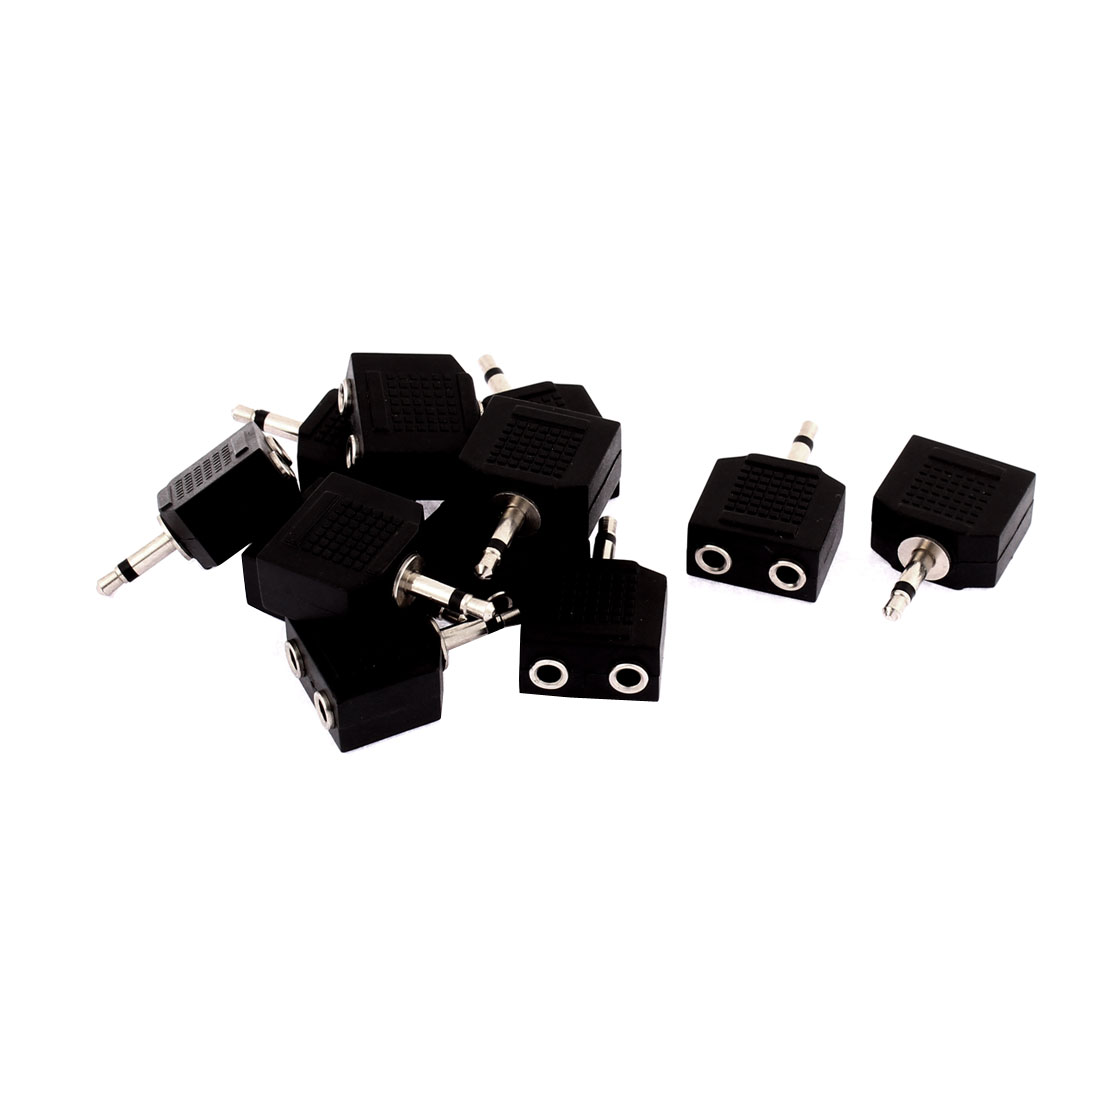 3.5mm Mono Audio Male Connector to Dual 3.5mm Jack Splitters 12Pcs